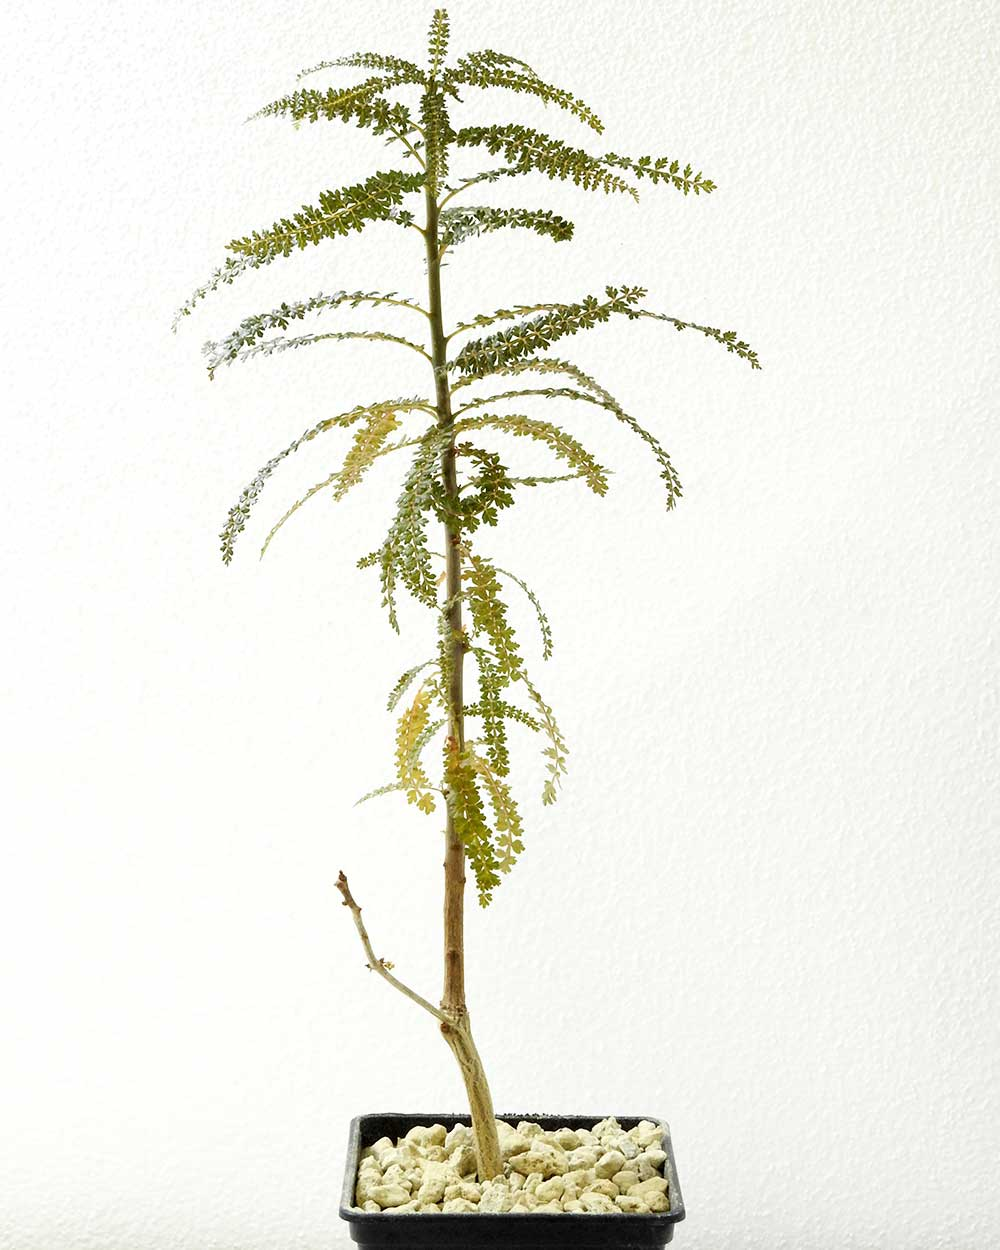 Boswellia socotrana – Big